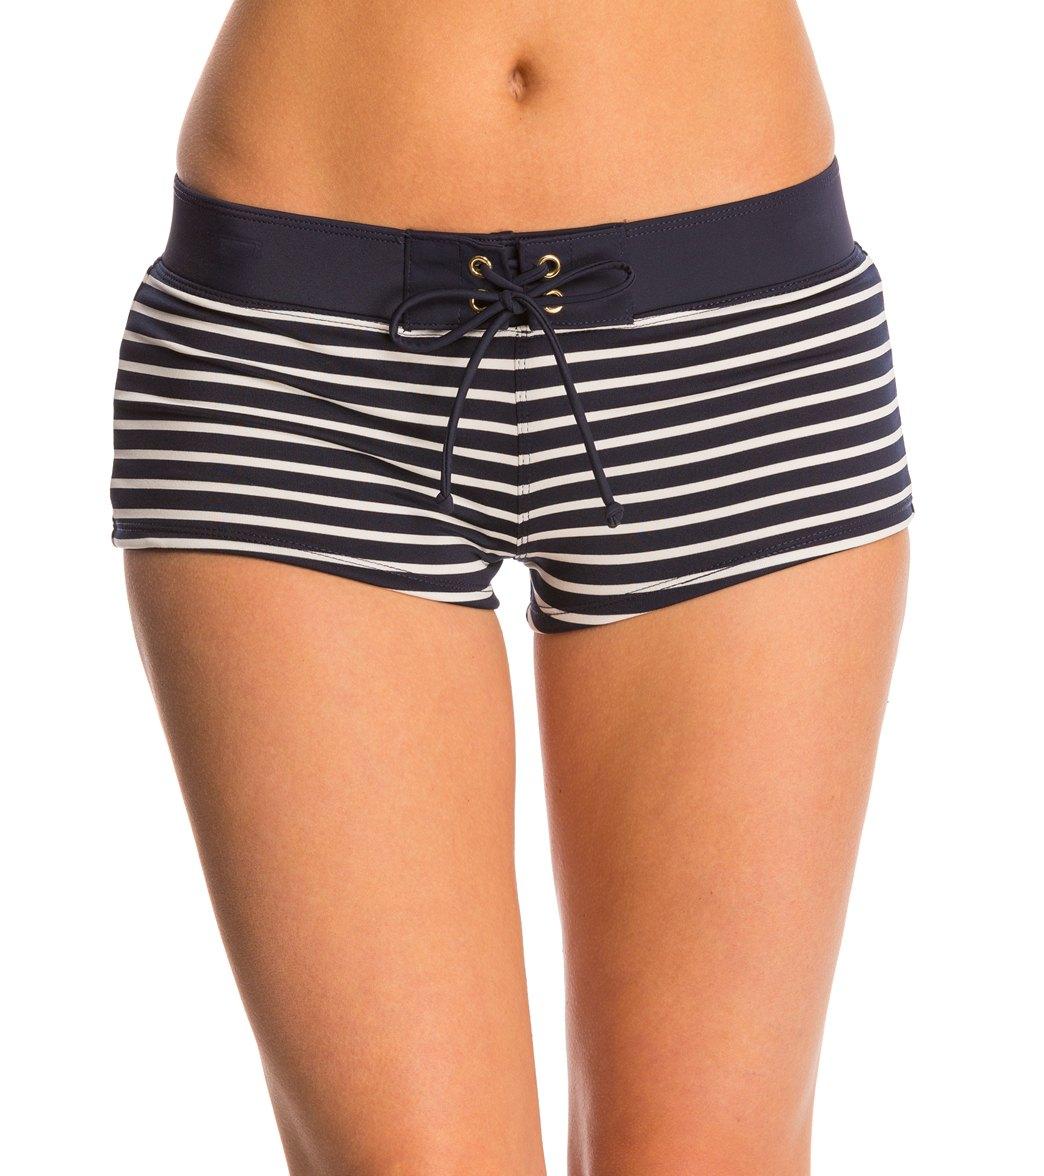 eef6c24418 Tommy Hilfiger Swimwear Sailing Stripes Boyshort Bikini Bottom at  SwimOutlet.com - Free Shipping